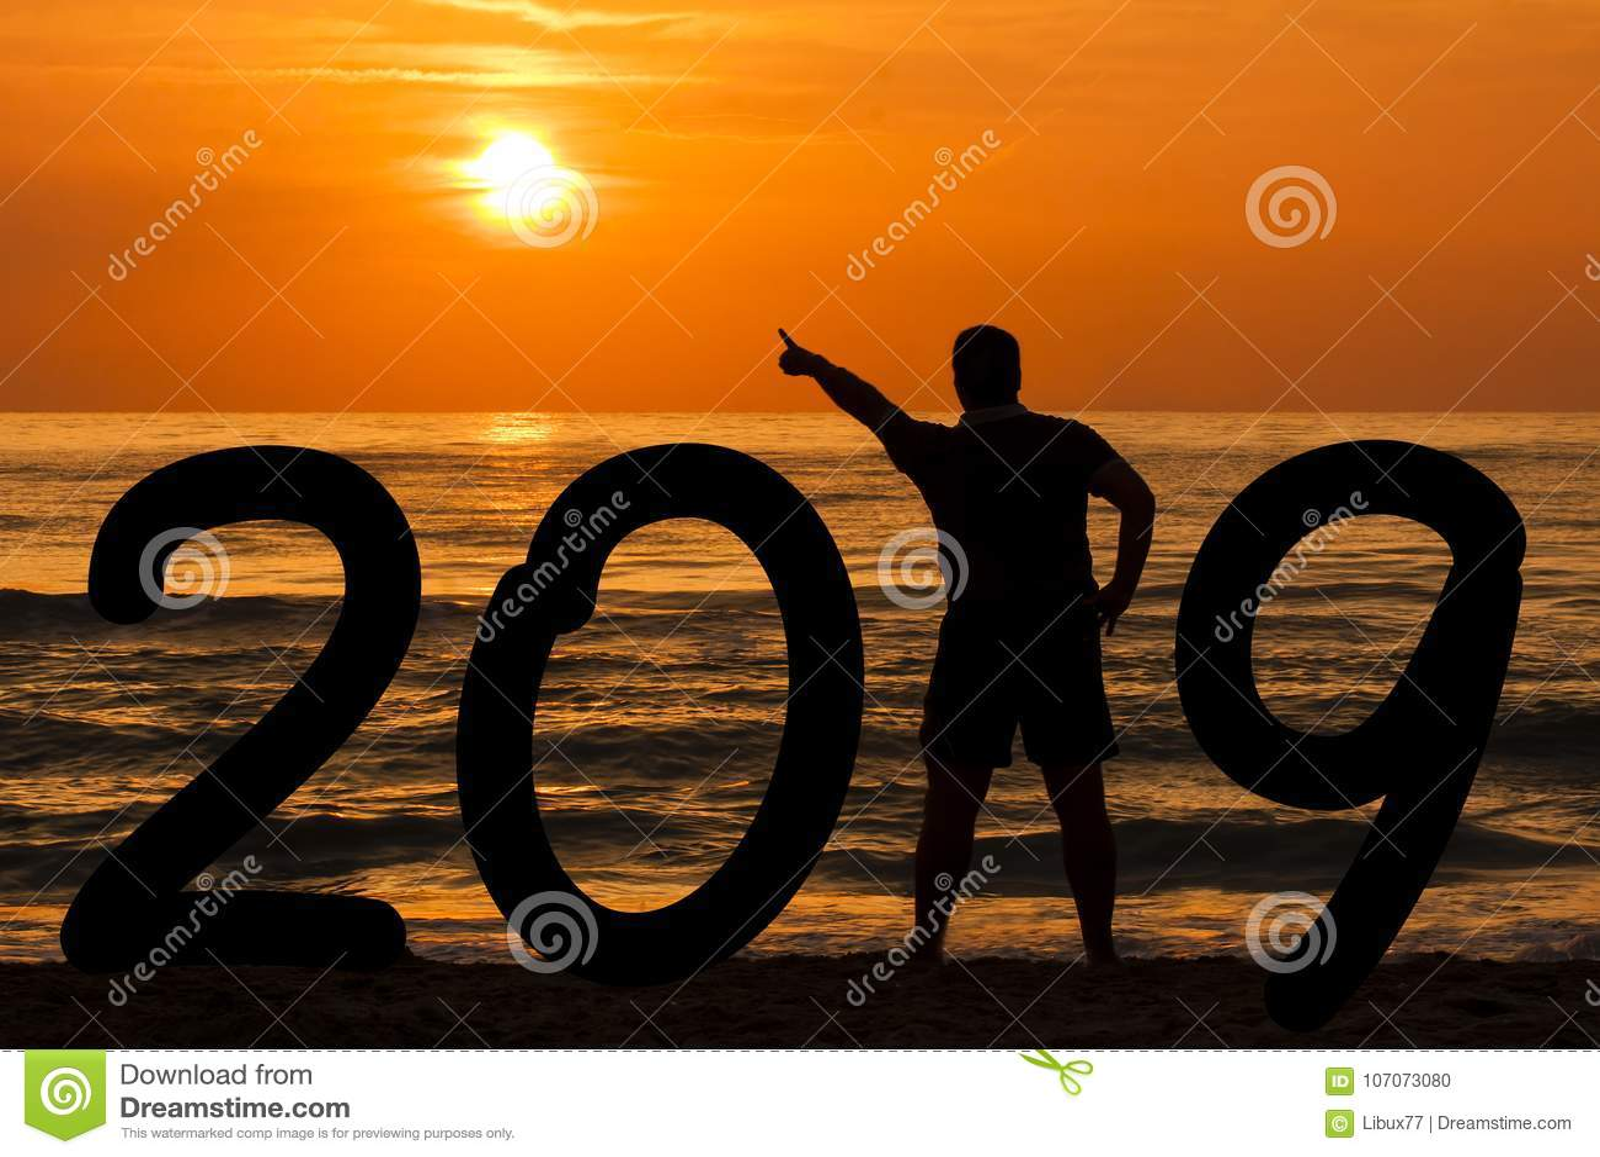 Man Silhouette year 2019 at sunrise at sea